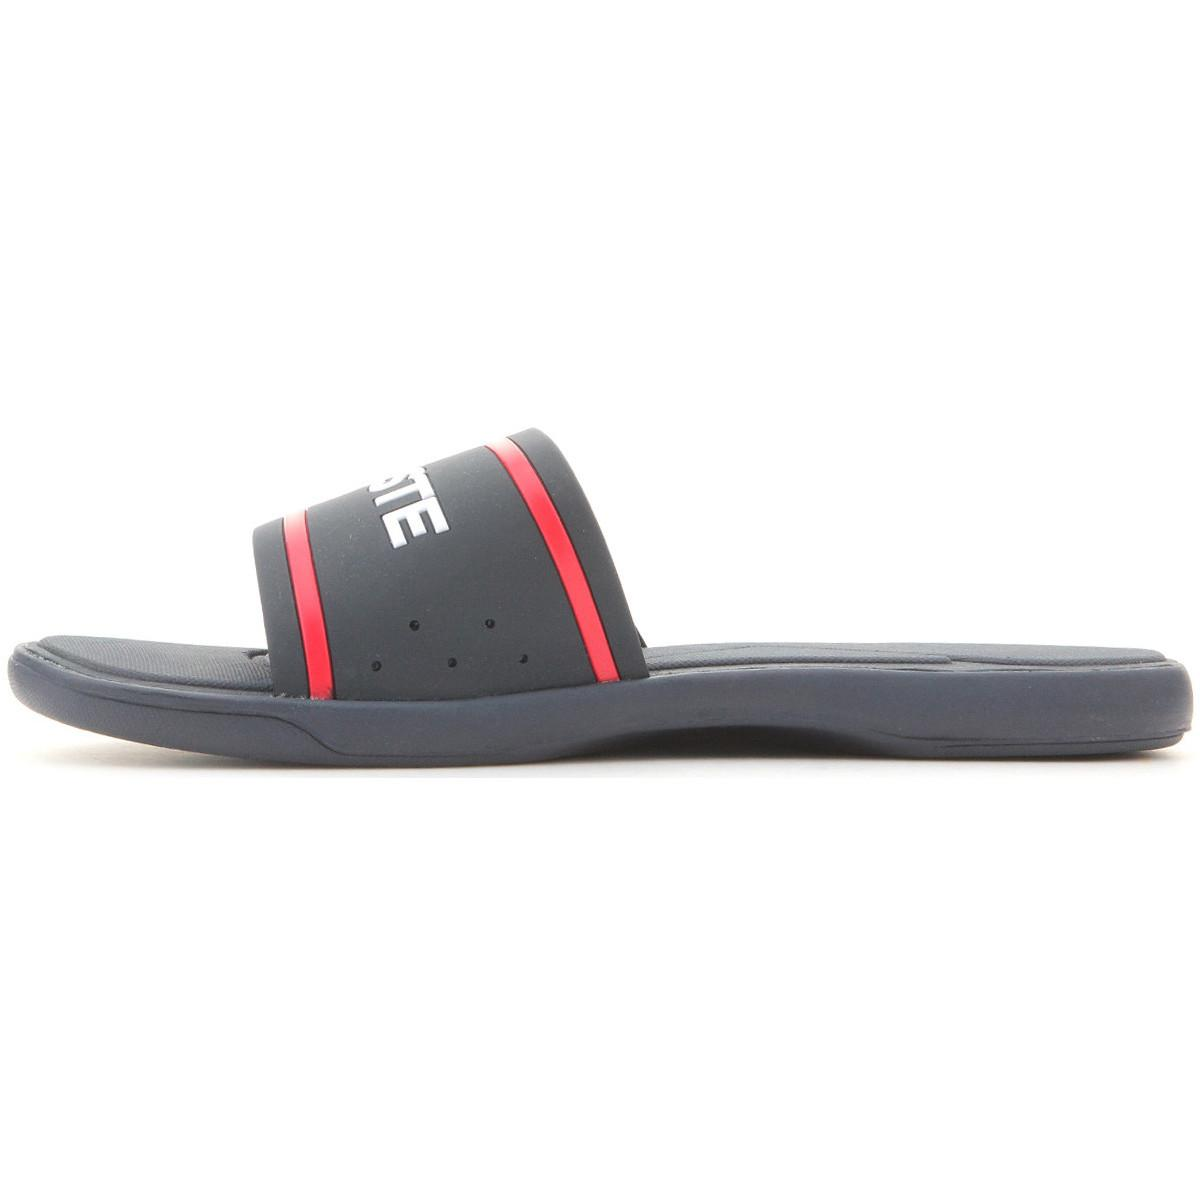 0b504efd9ca9 Lacoste L.30 Slide 118 2 Cam 7-35cam0061144 Men s Sandals In ...